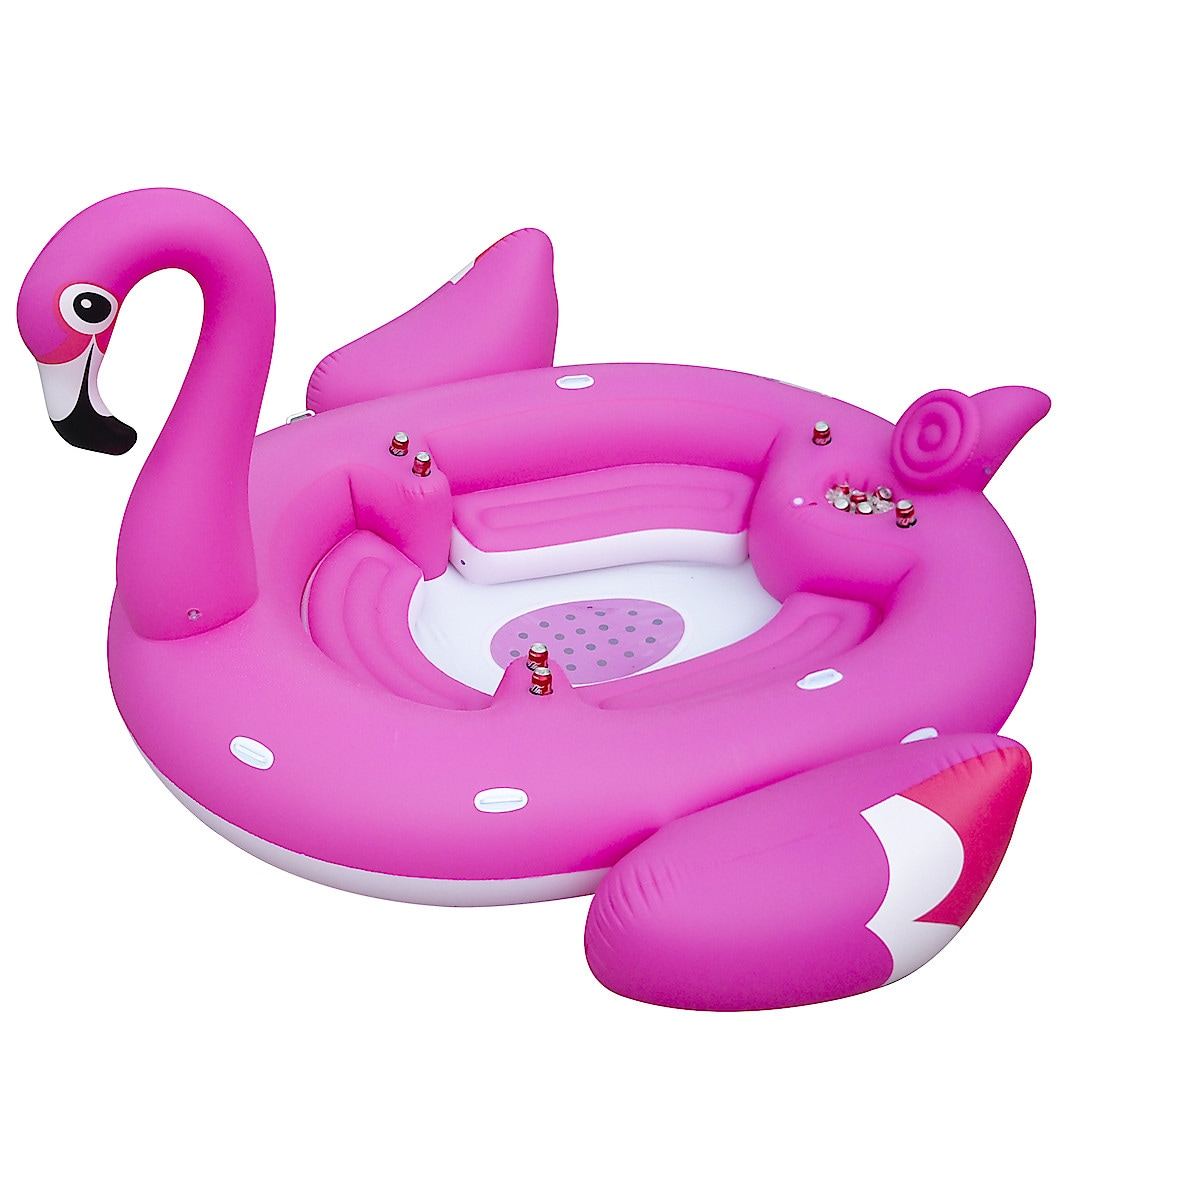 Mega Flamingo, oppblåsbar flåte, 3,7 x 3,7 meter